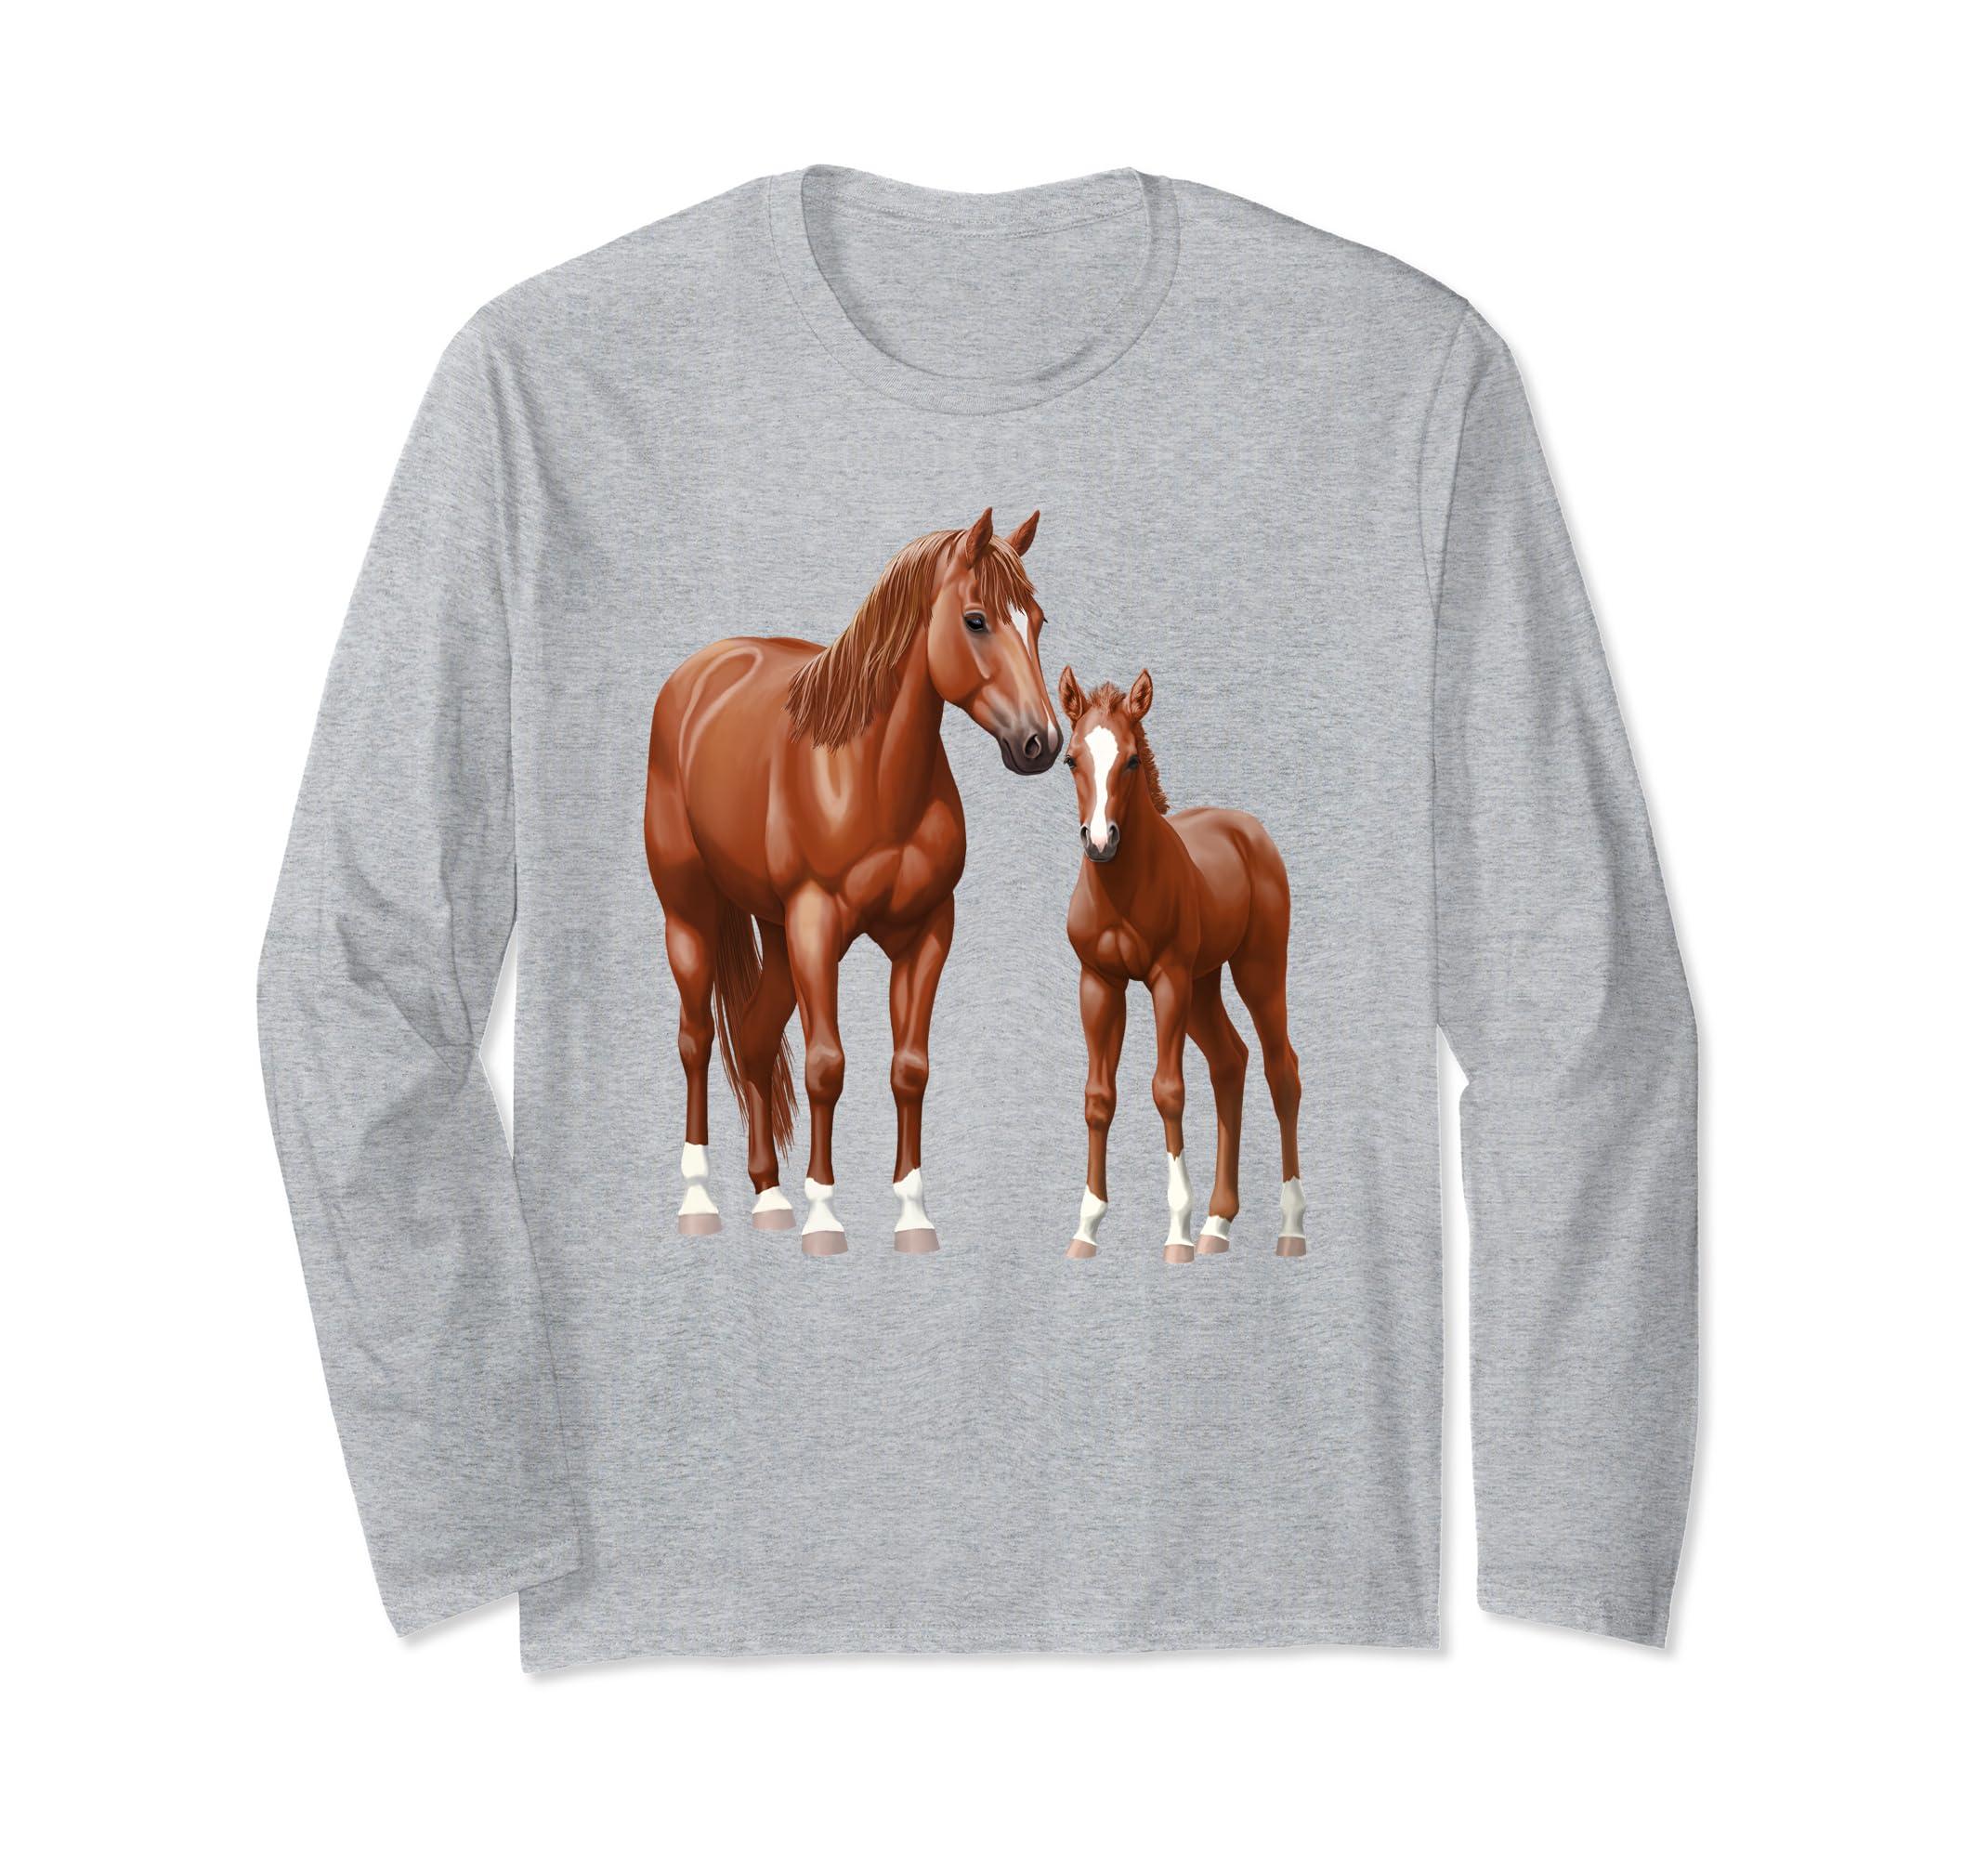 Beautiful Chestnut Quarter Horse Mare & Foal Shirt-ln